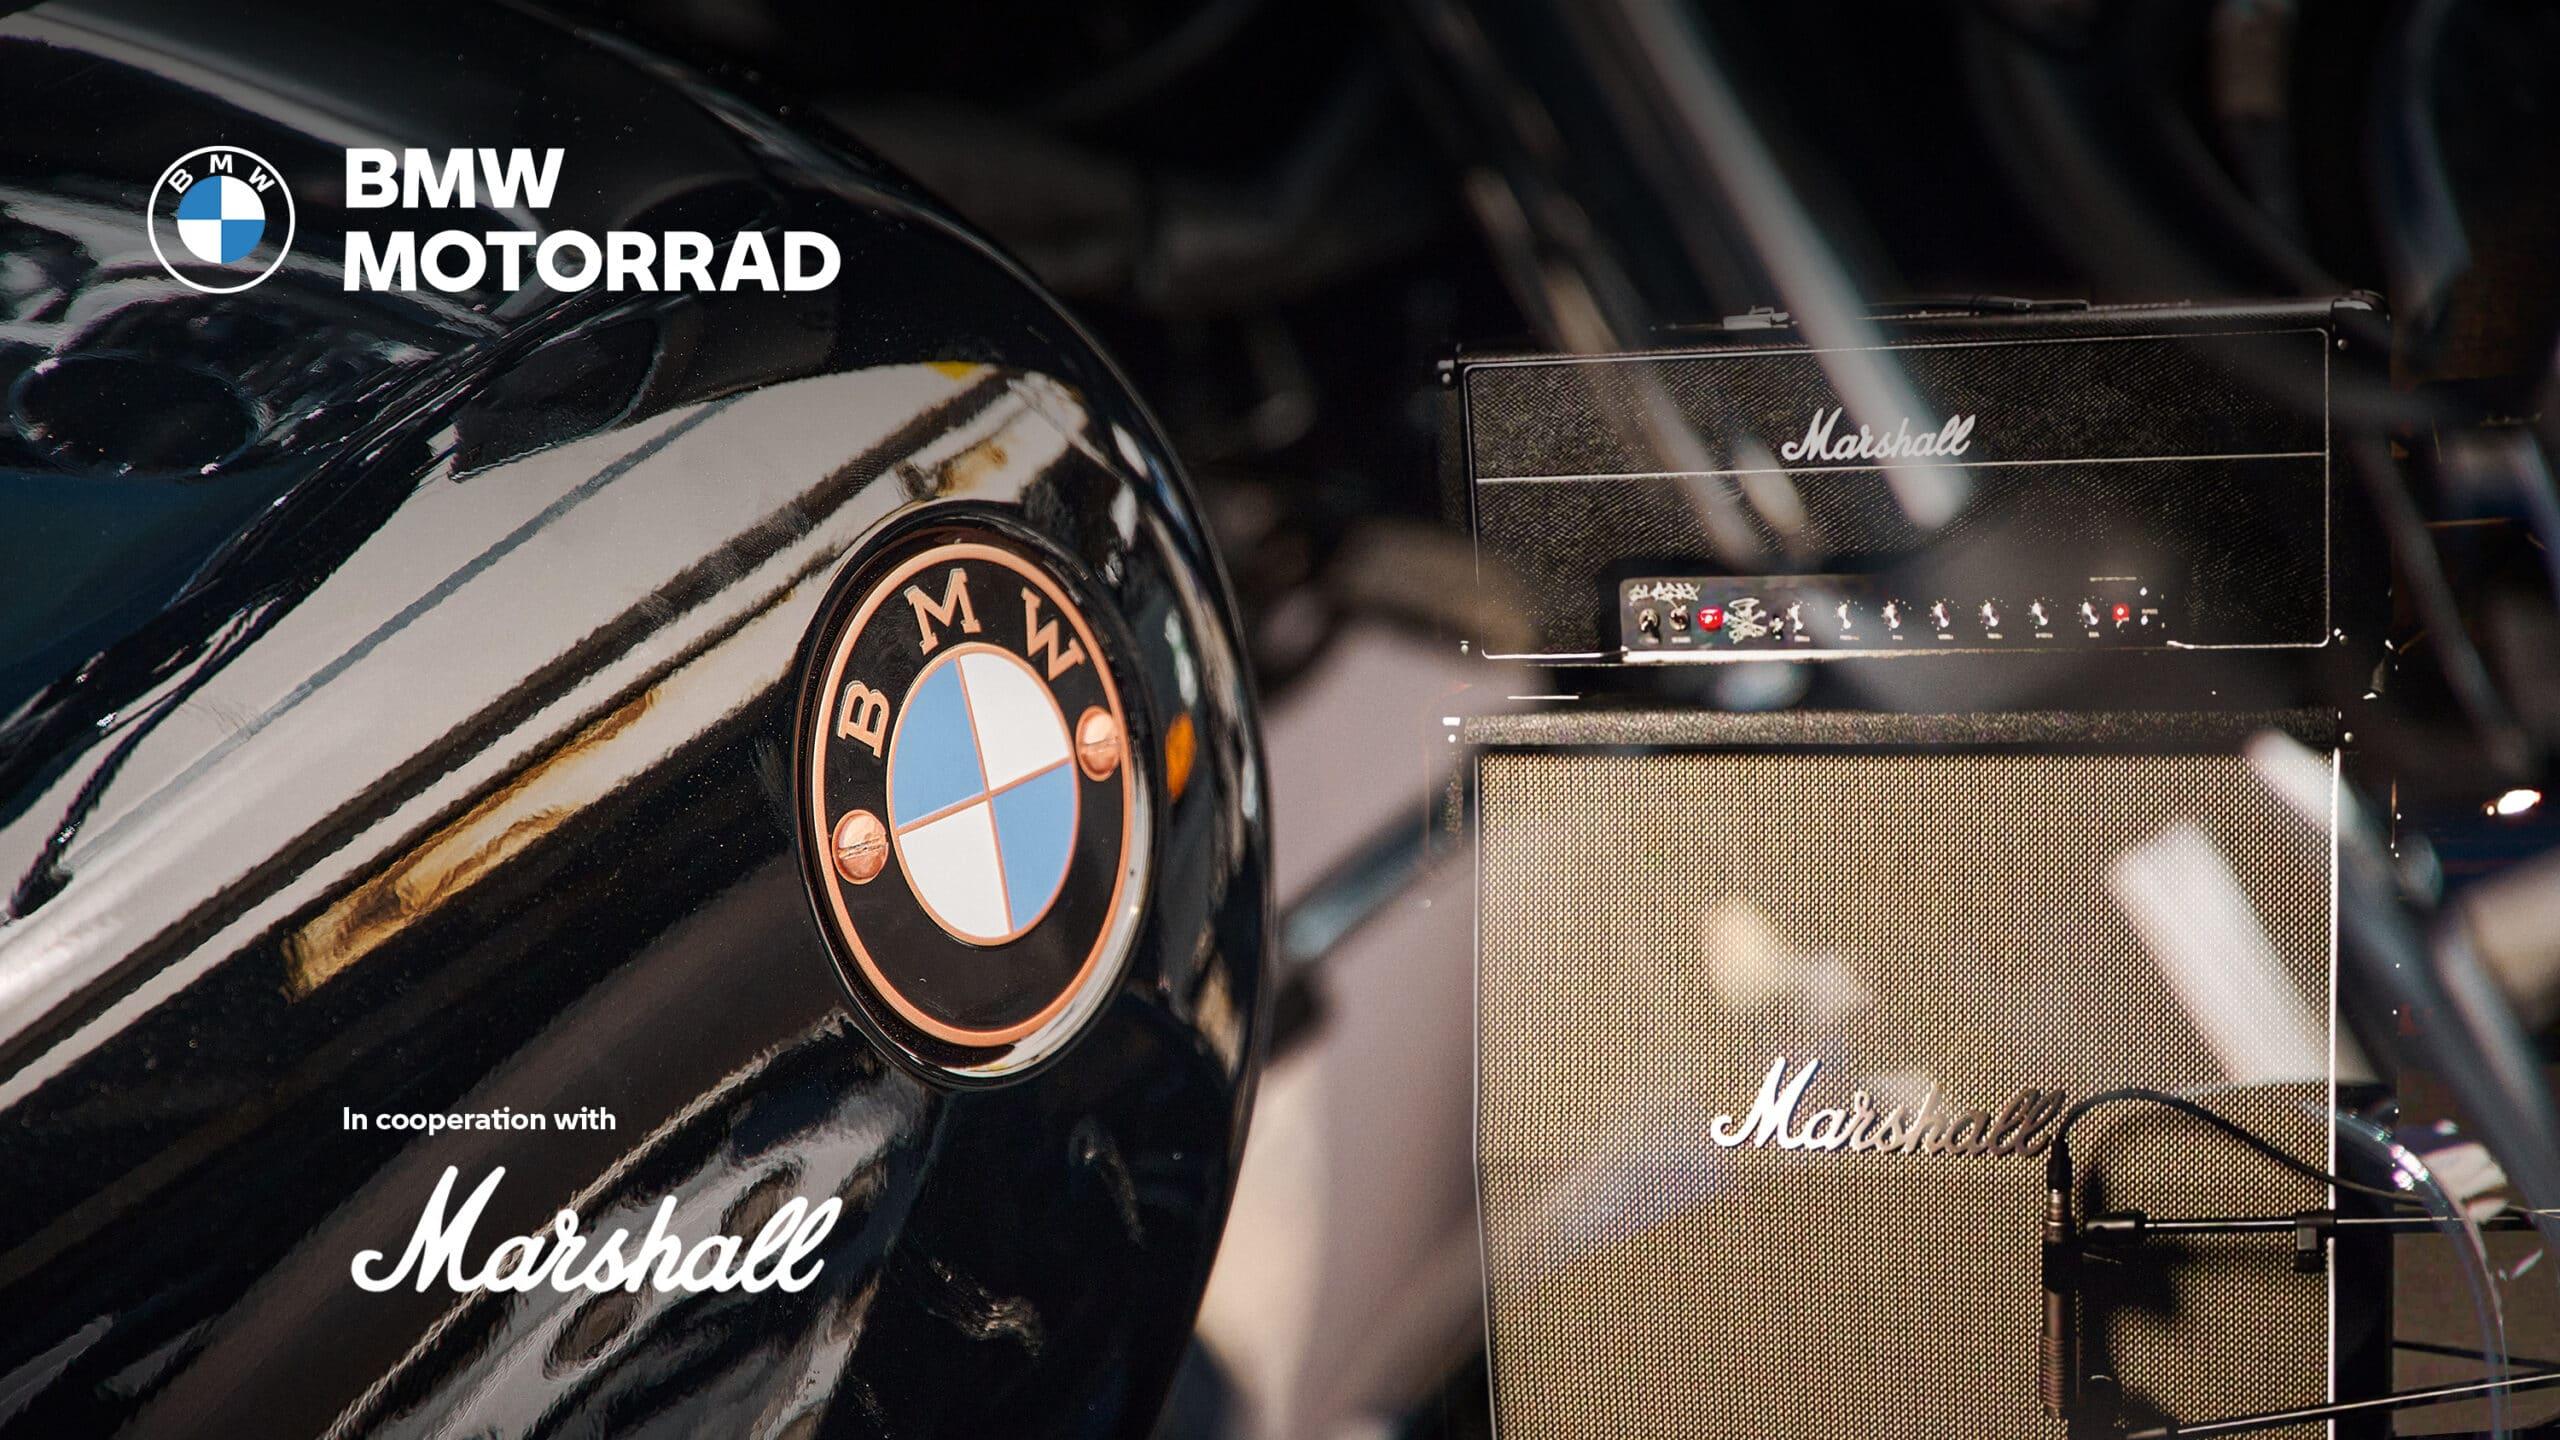 Le moto BMW in anteprima nel nuovo video musicale dei The Cadillac Three thumbnail